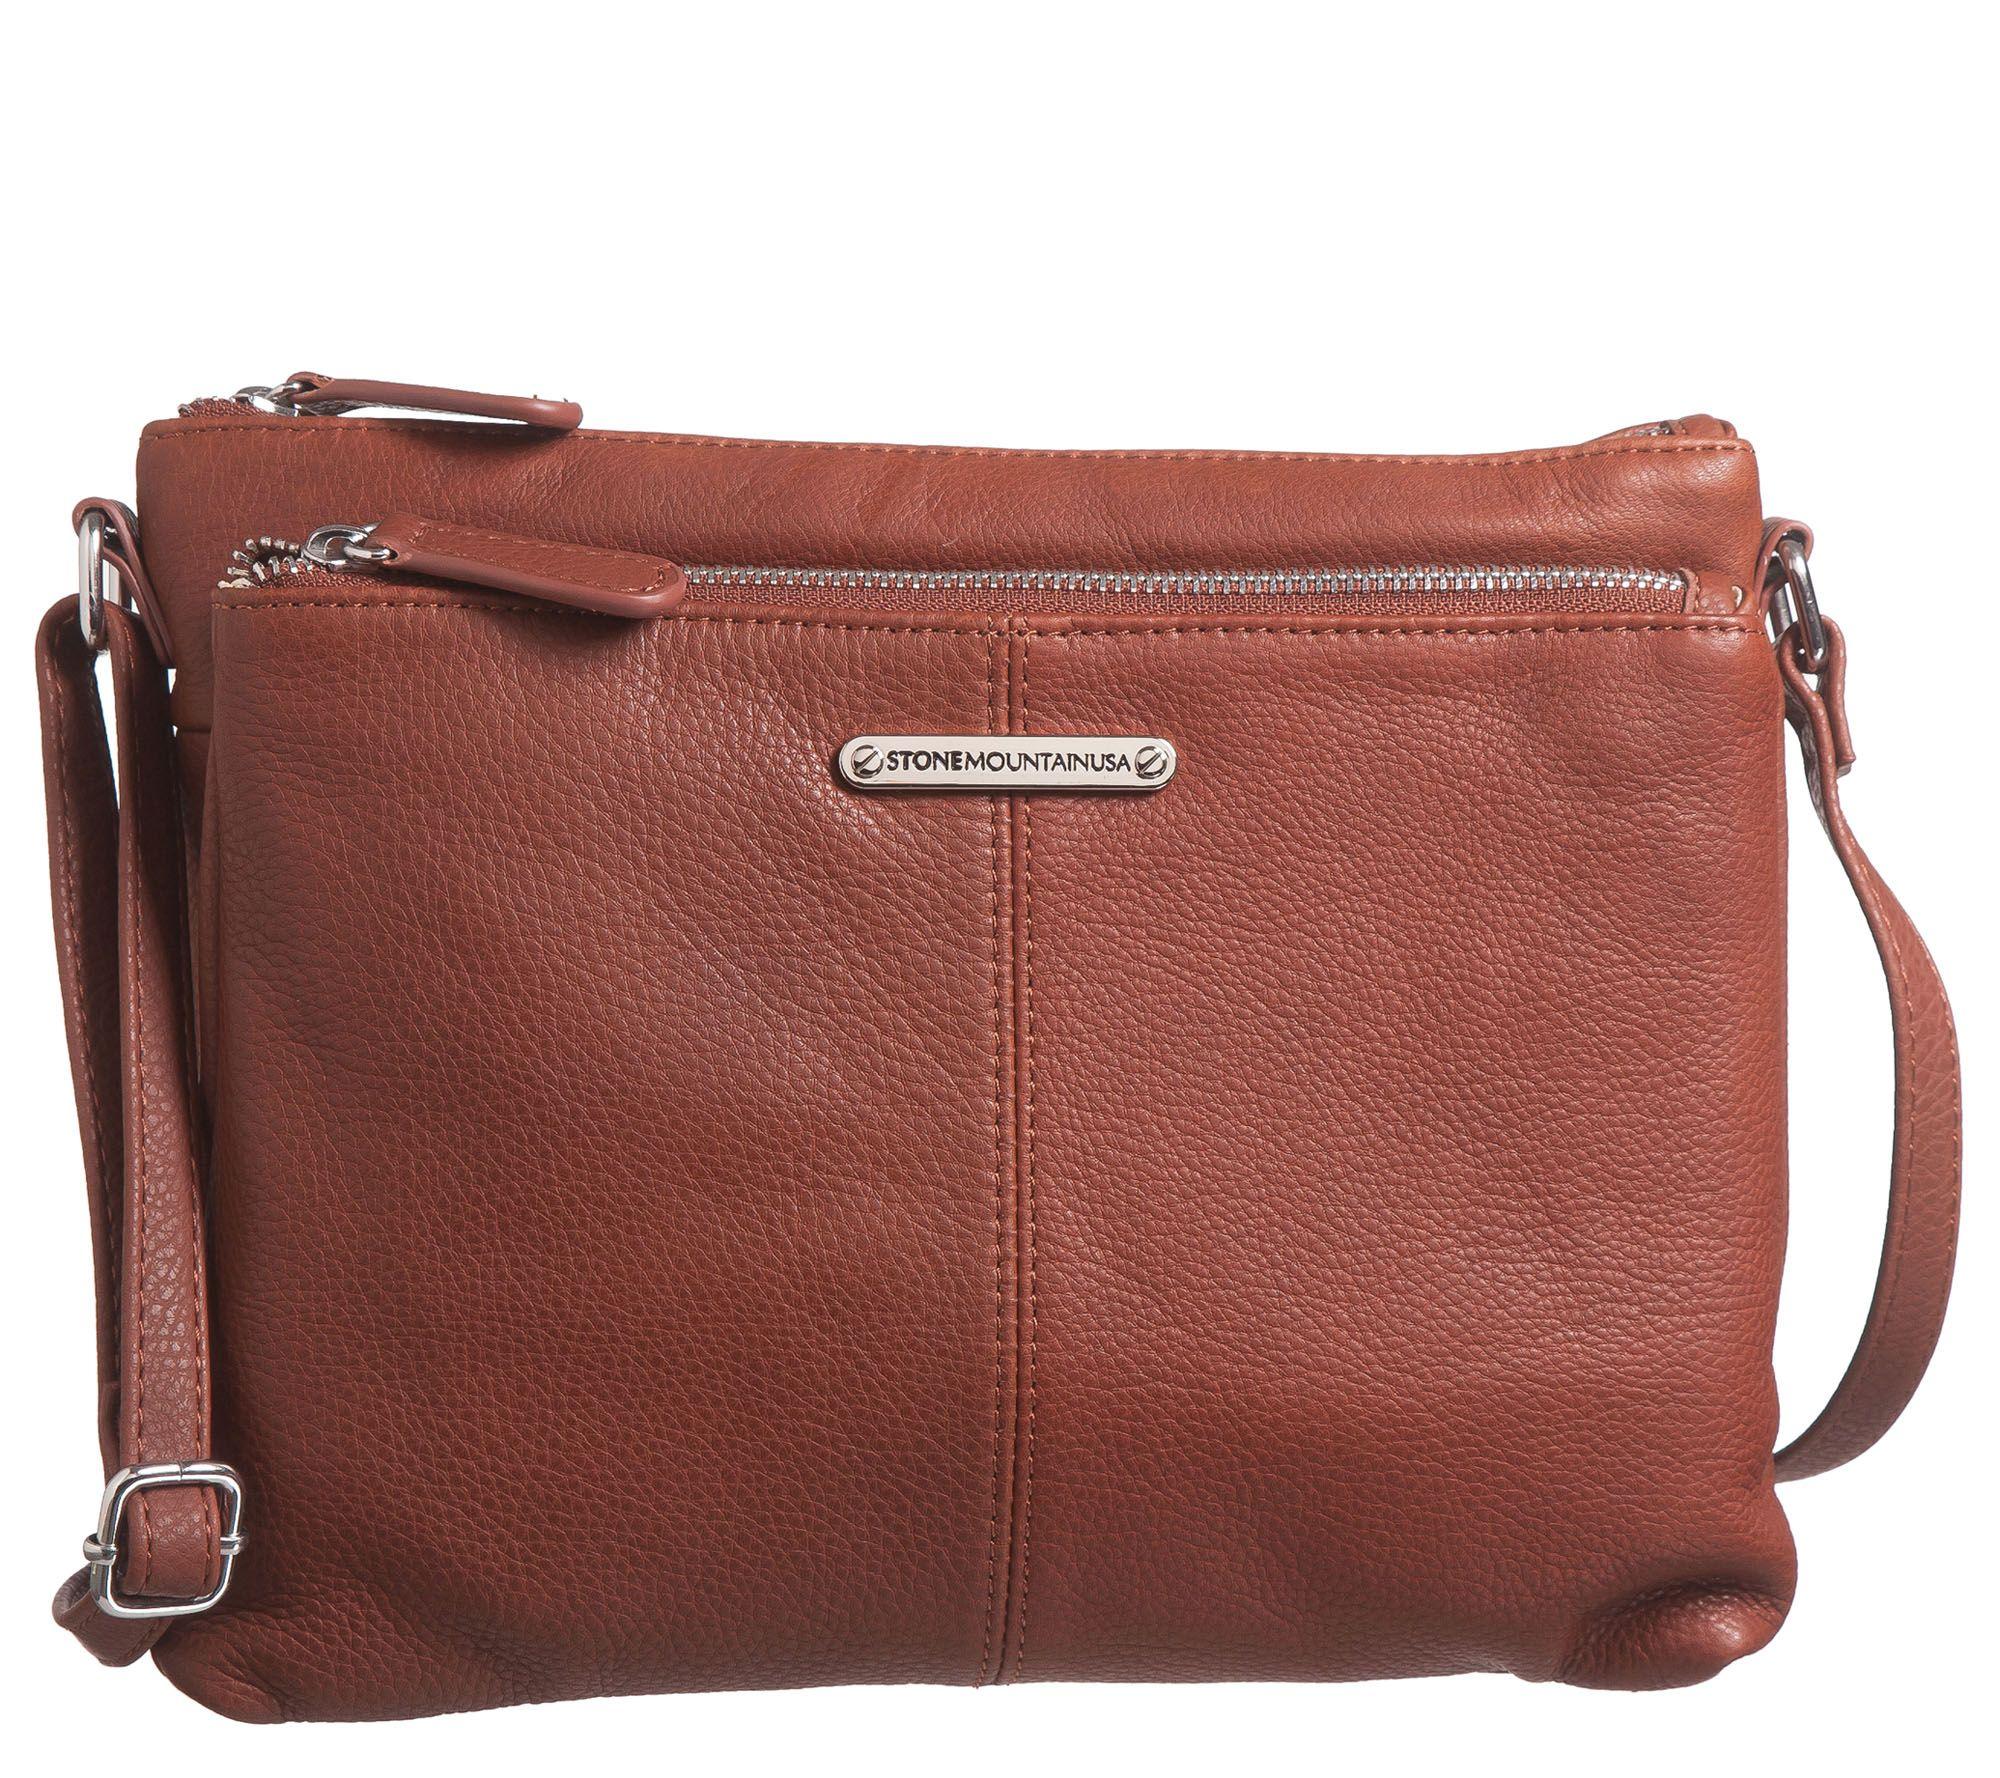 923c2fd560b02c Stone Mountain USA Butter Leather Two-Pocket Crossbody Bag — QVC.com